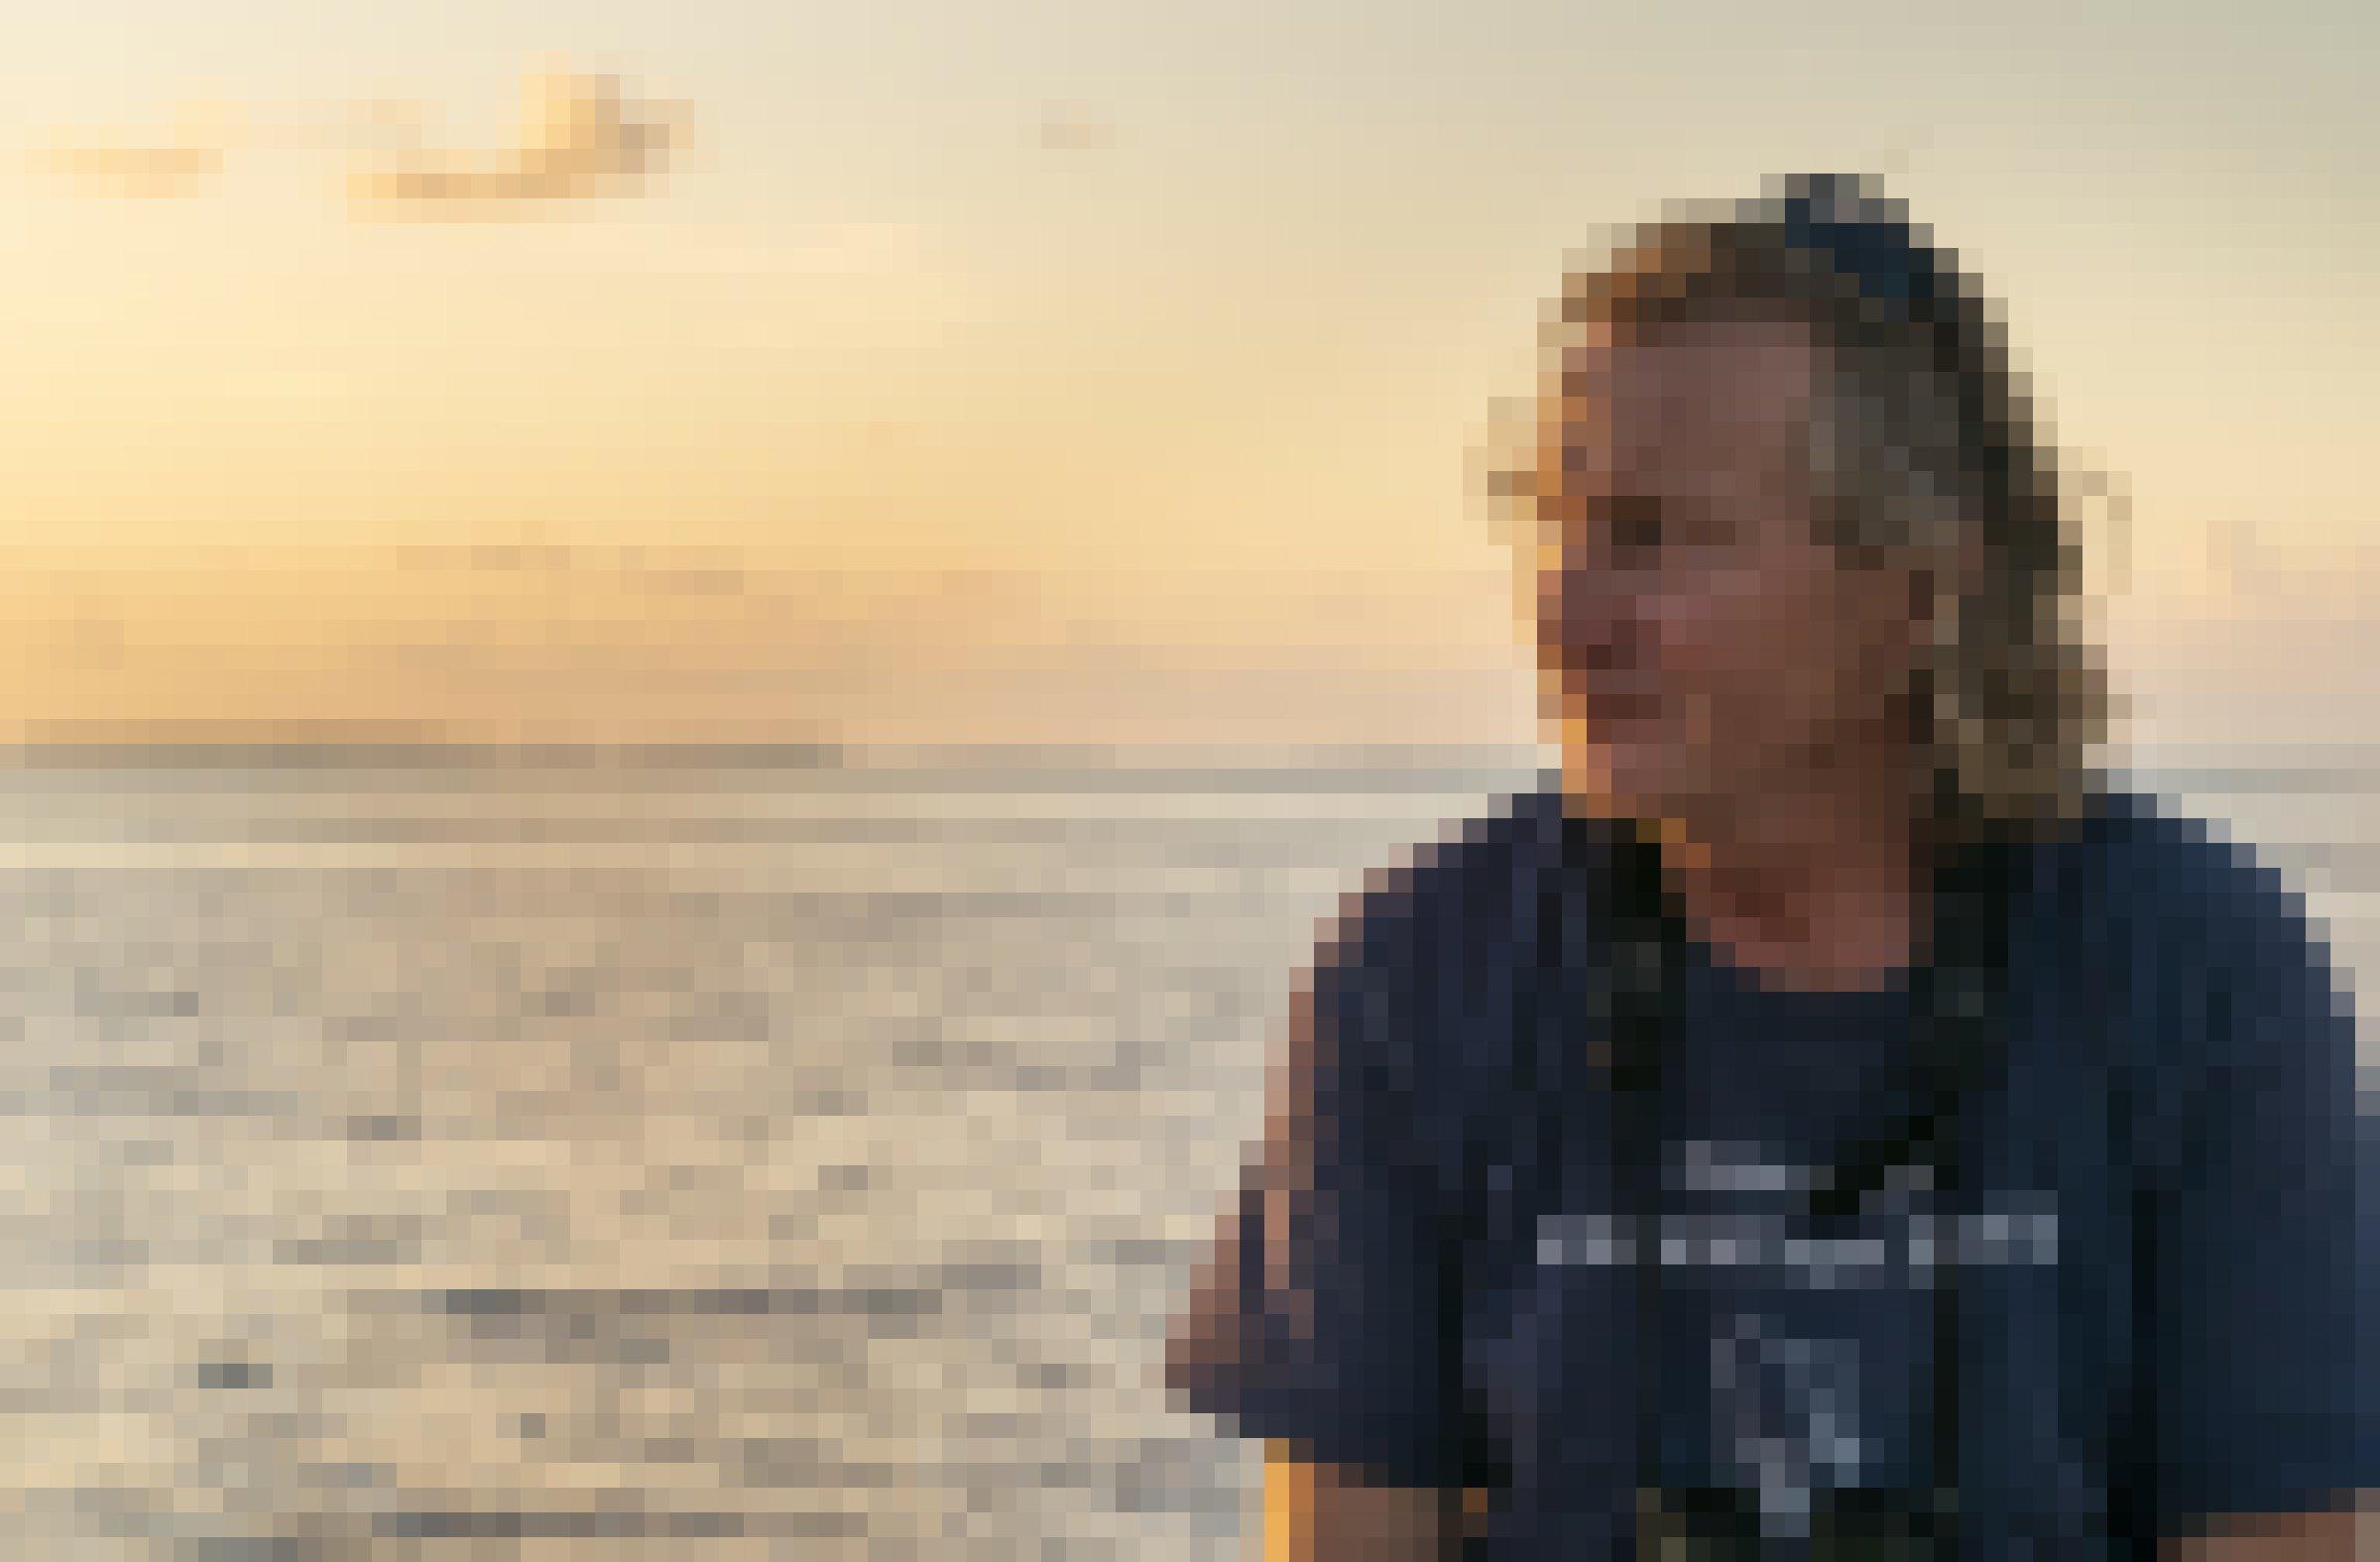 Der Ornithologe Peter Carr an Bord eines Schiffes im Chagos-Archipel.